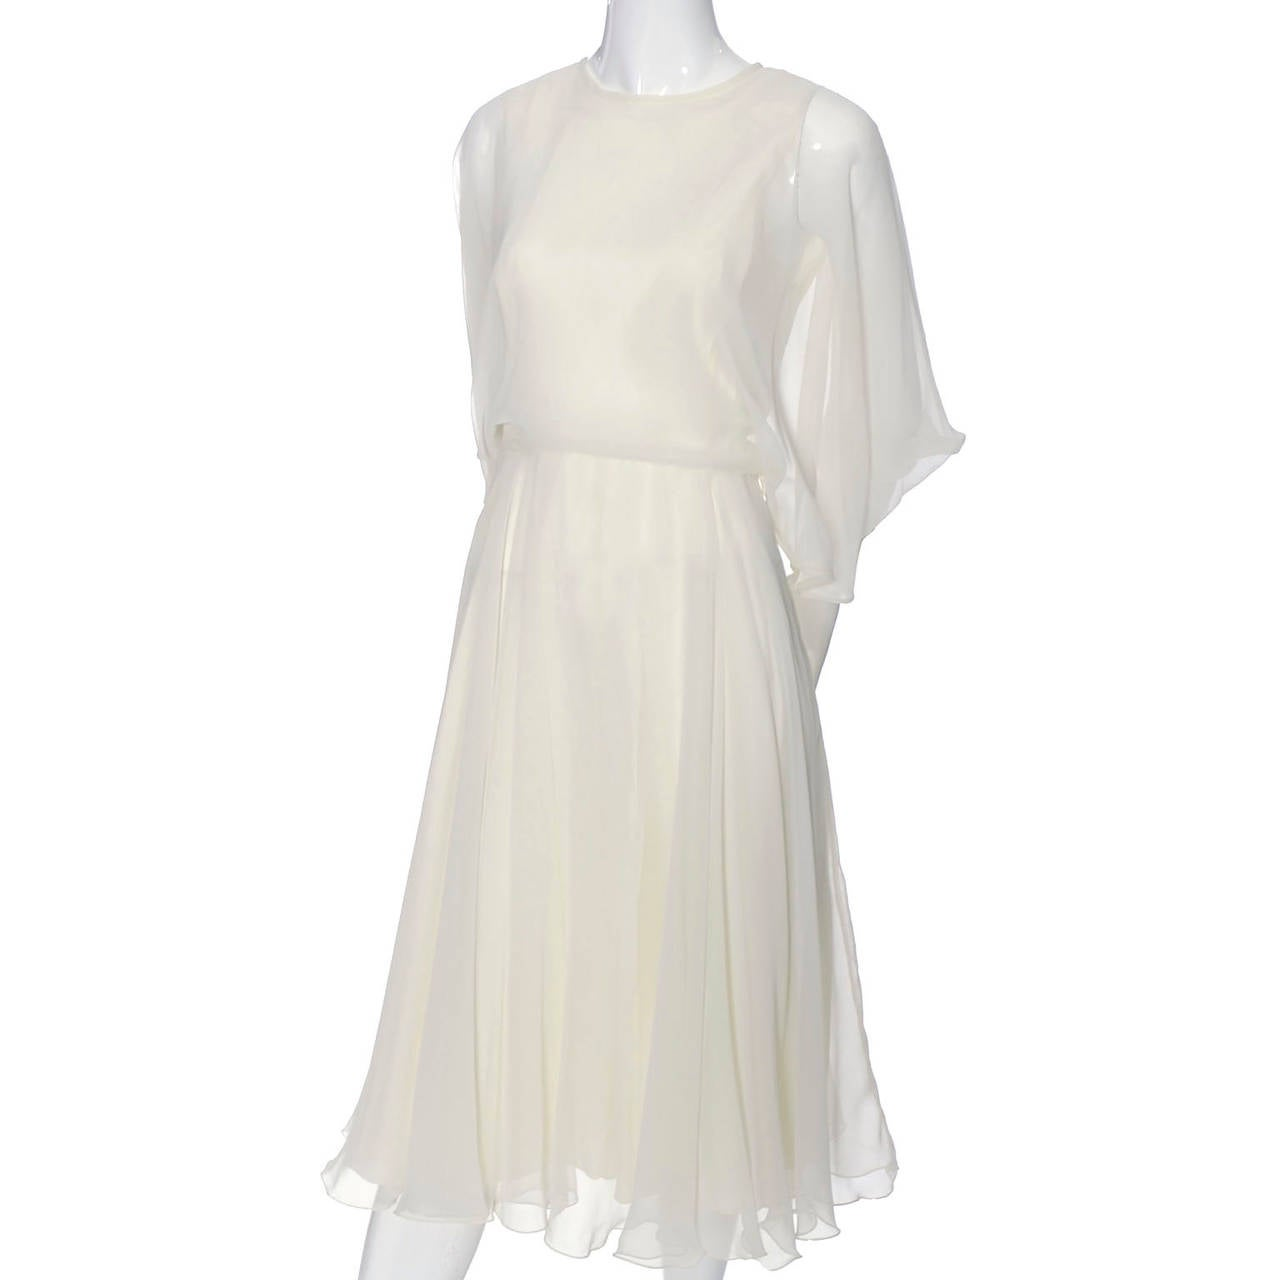 1970s Vintage Jean Varon John Bates Chiffon Designer Dress Batwing Sleeves For Sale 4